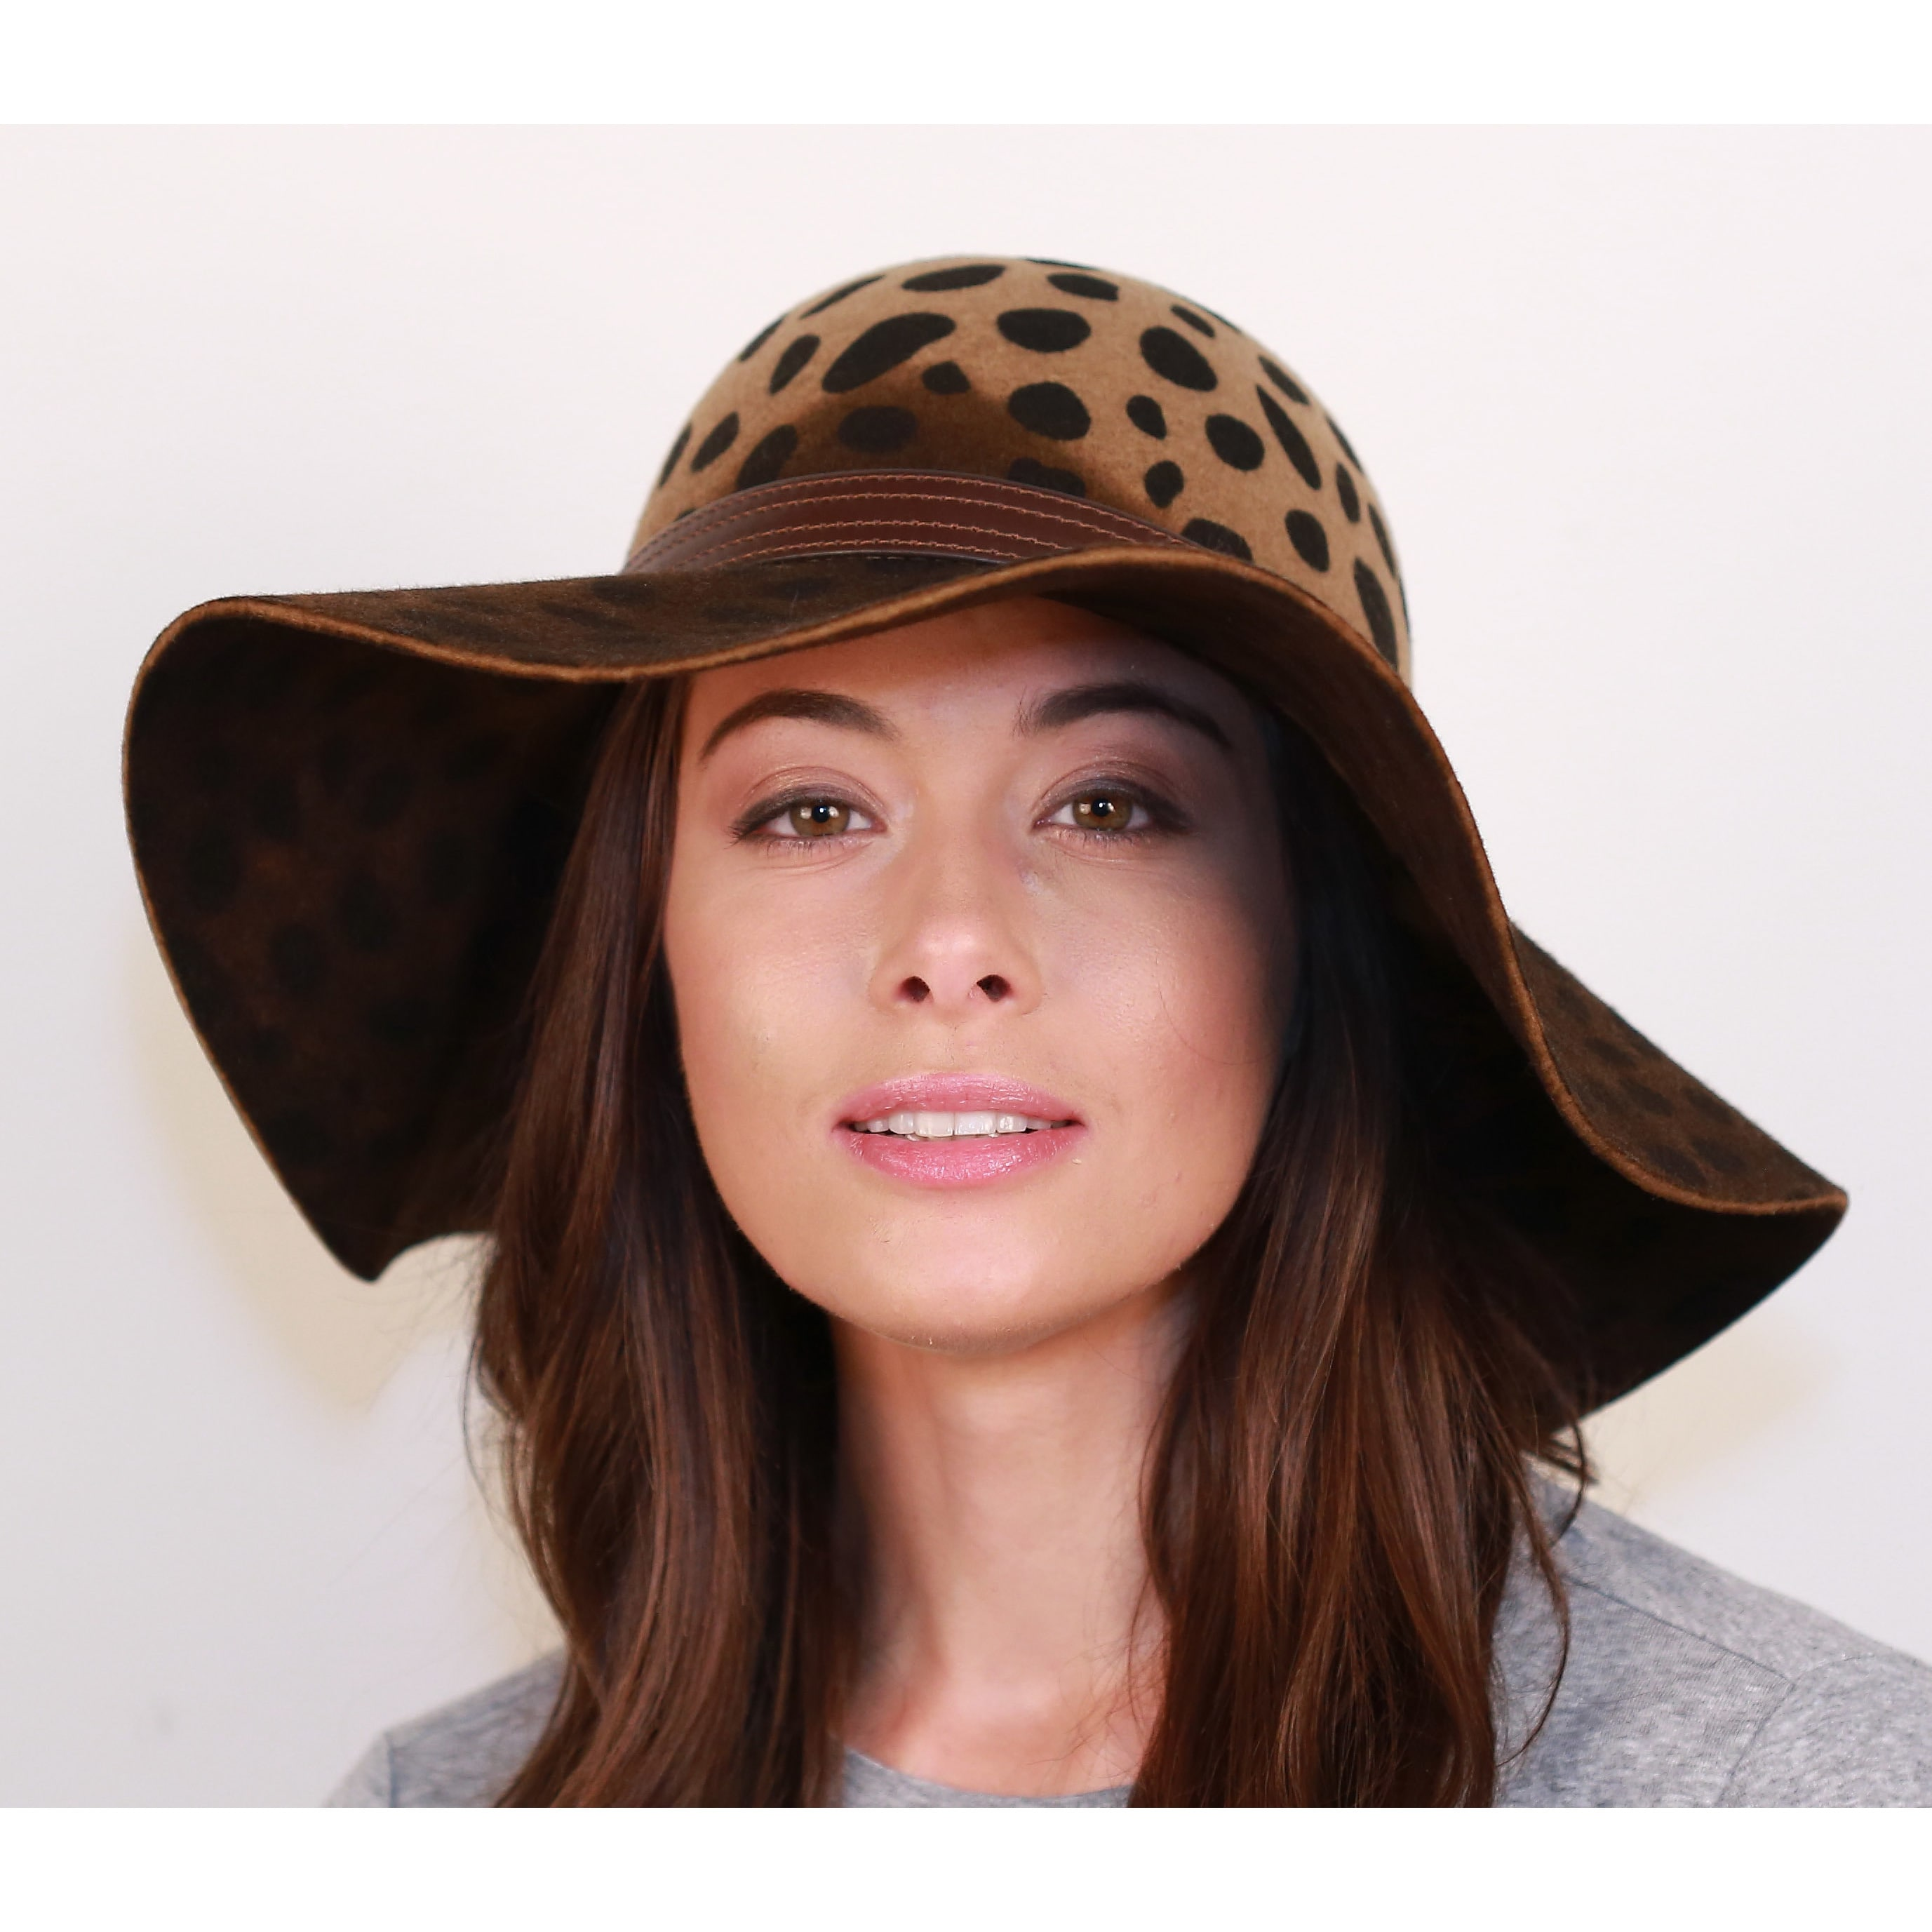 878543c1f46 Shop Hatch Leopard Safari Wool Felt Floppy Women s Hat - Free Shipping Today  - Overstock - 19433911